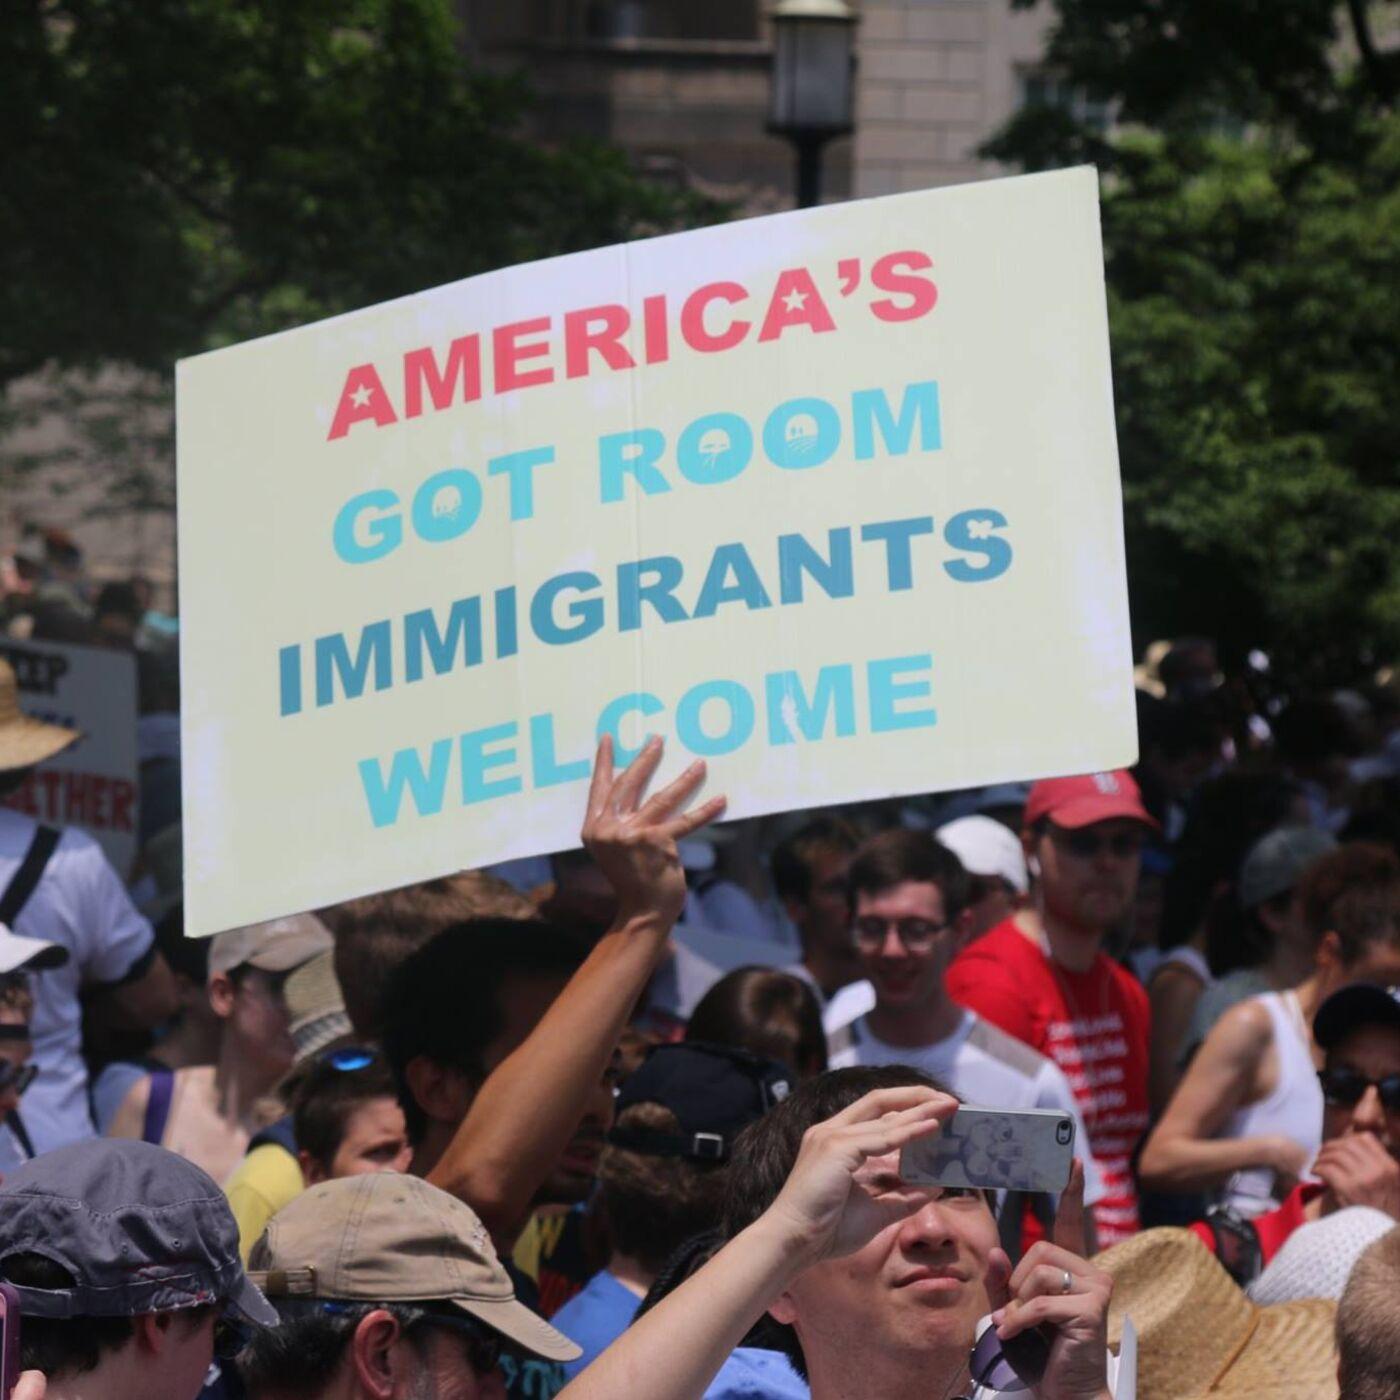 Activist Cristina Jiménez: Rep. John Lewis´ legacy lives on through the fight for immigration reform